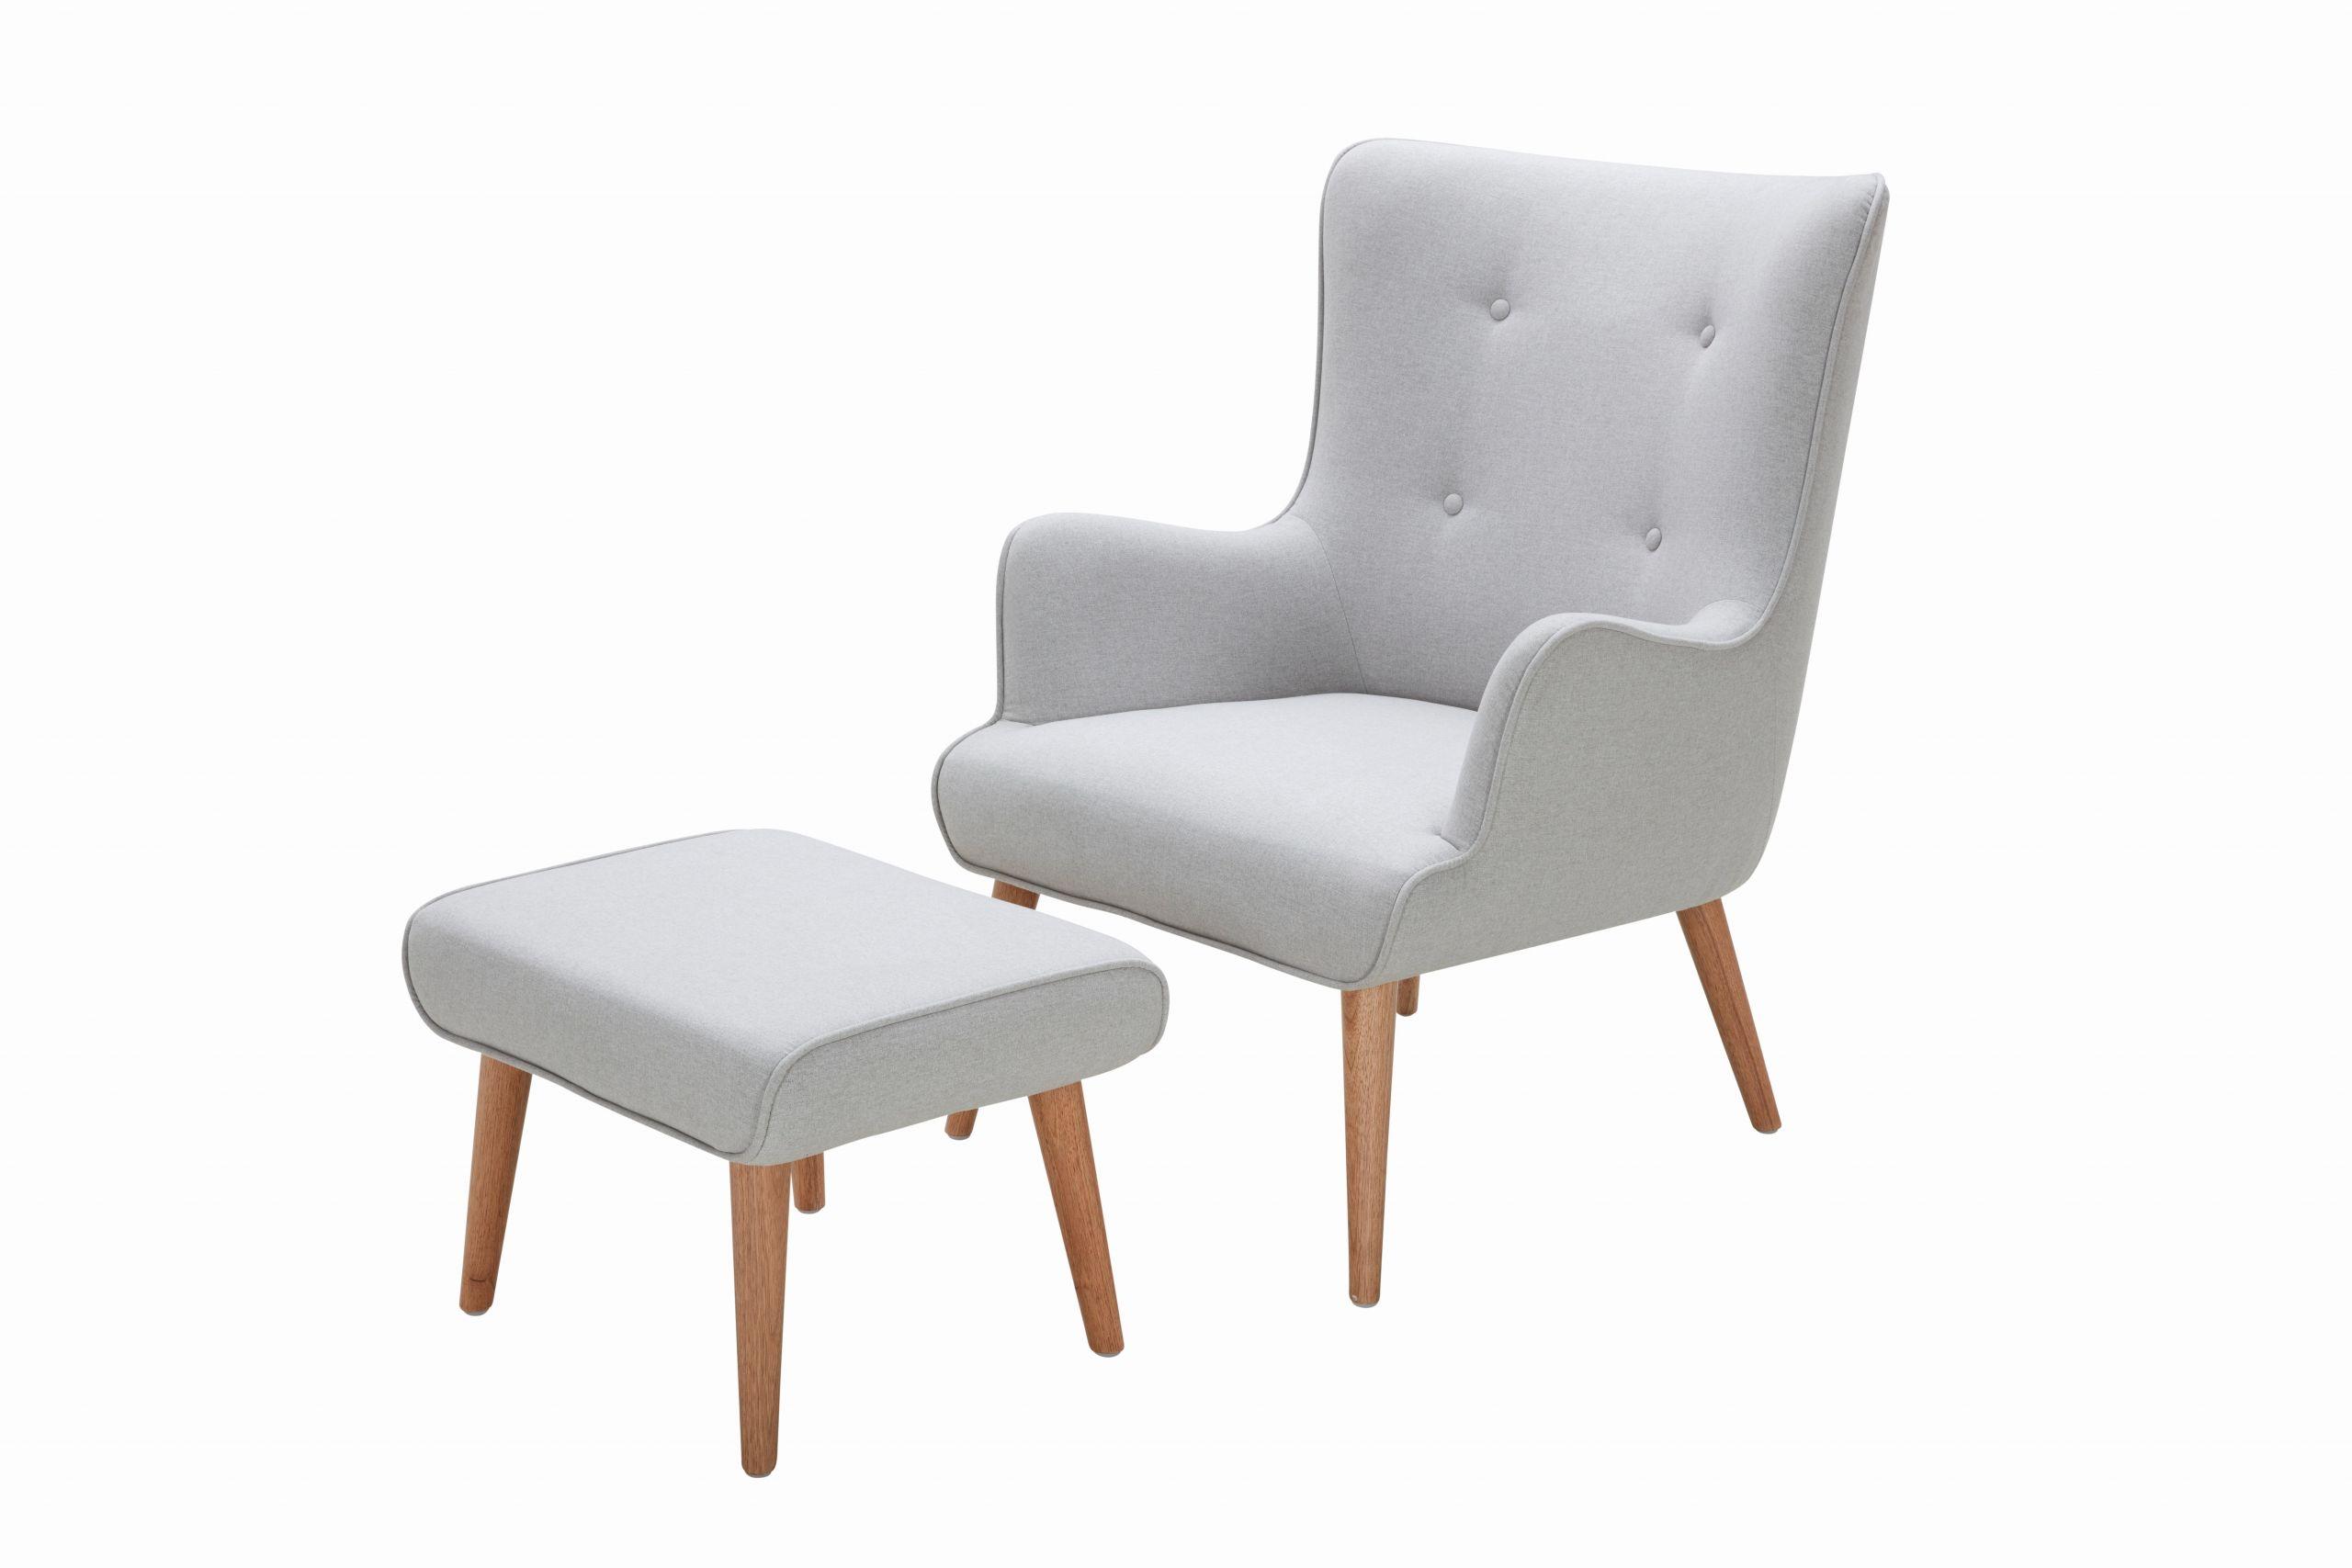 chaise simili cuir frais chaise vintage tissu fauteuil de table tissu frais fauteuil salon 0d of chaise simili cuir